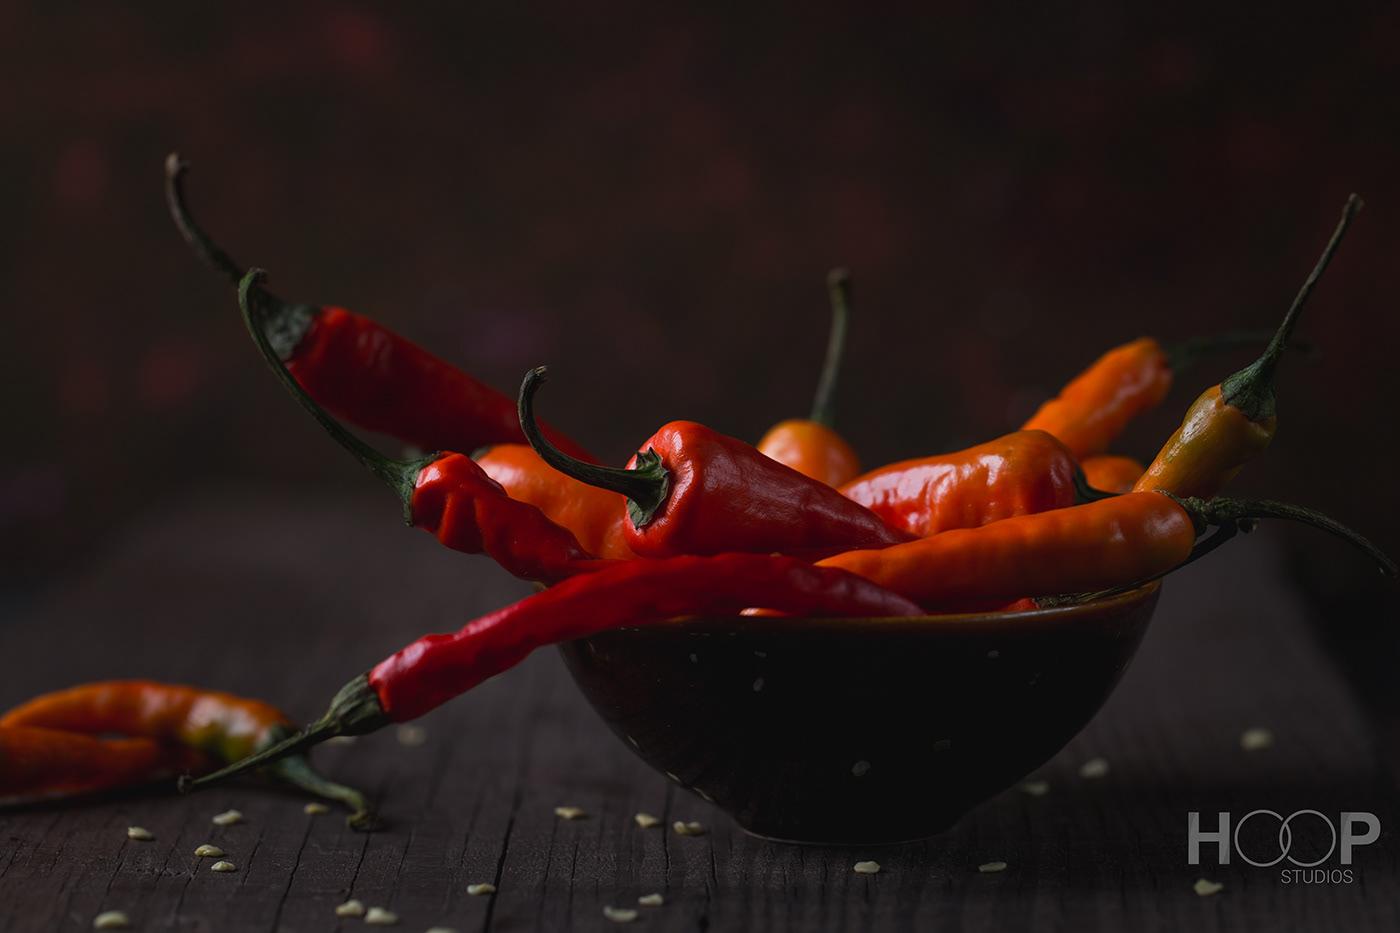 Red Chili / фото Abbas Ishfaq